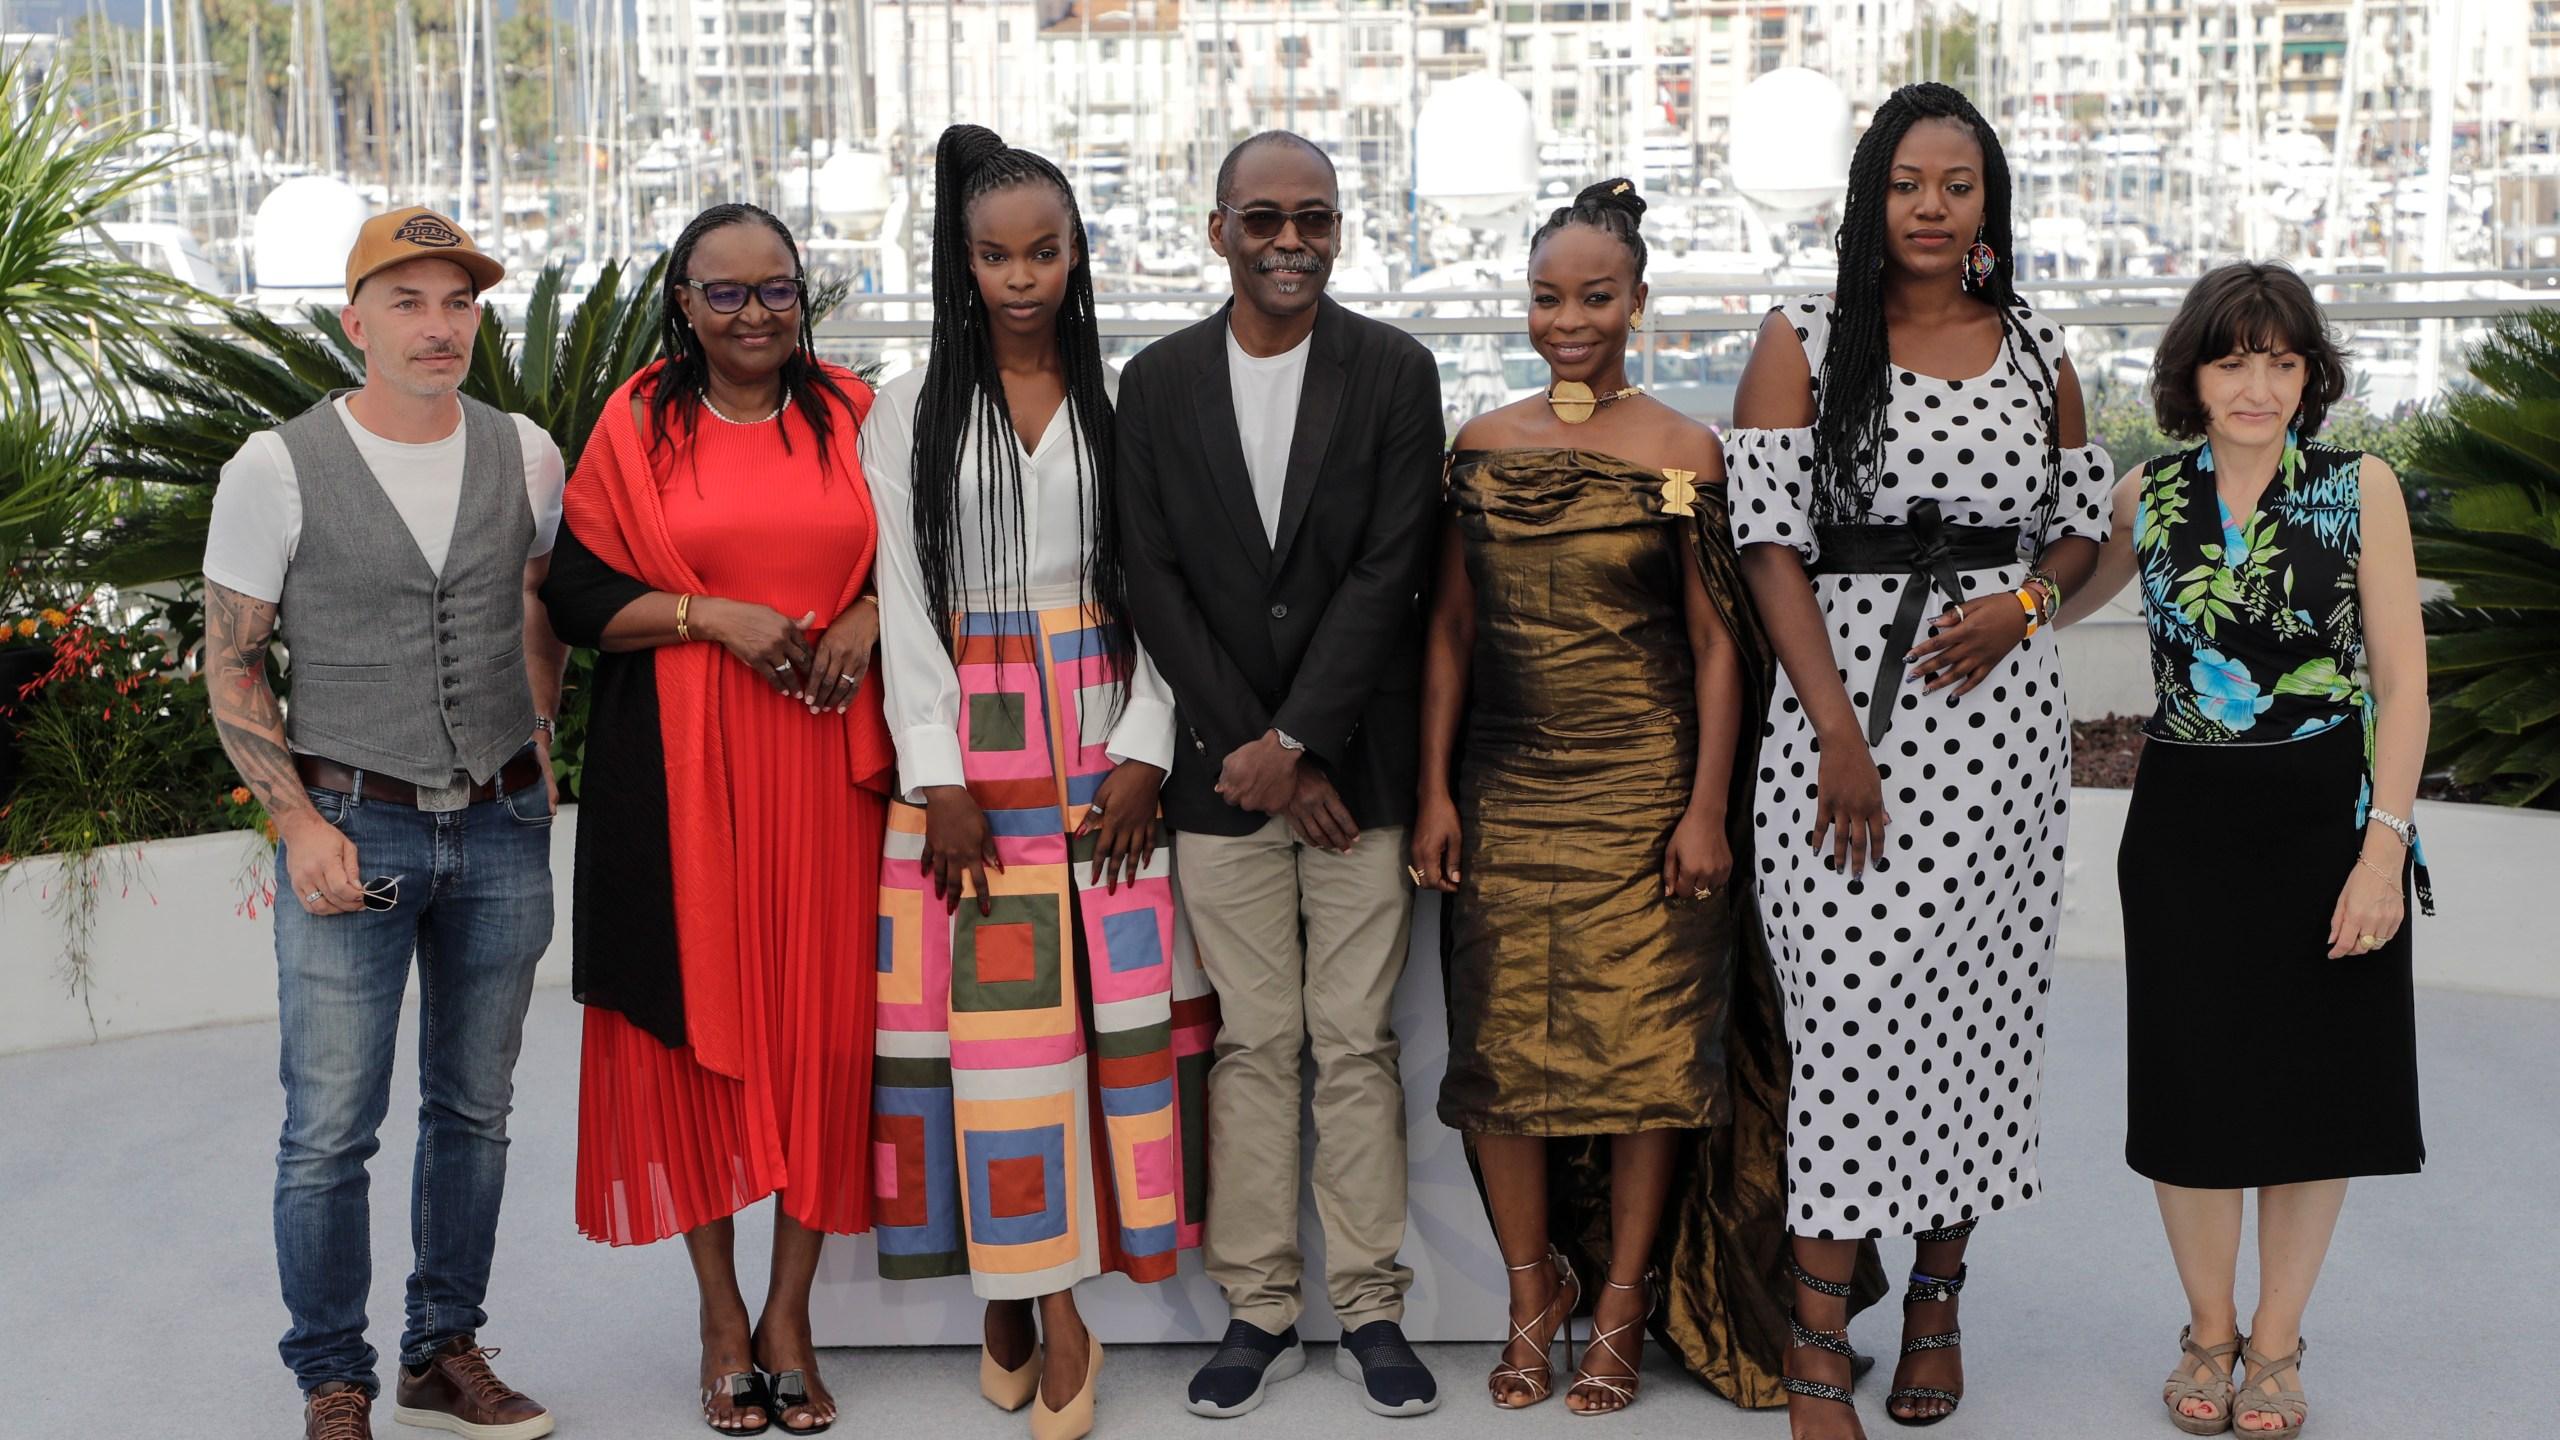 Mathieu Giombini, Hadje Fatime Ngoua, Rihane Khalil Alio, Mahamat-Saleh Haroun, Achouackh Abakar Souleymane, Bria Gomdigue, Florence Stern